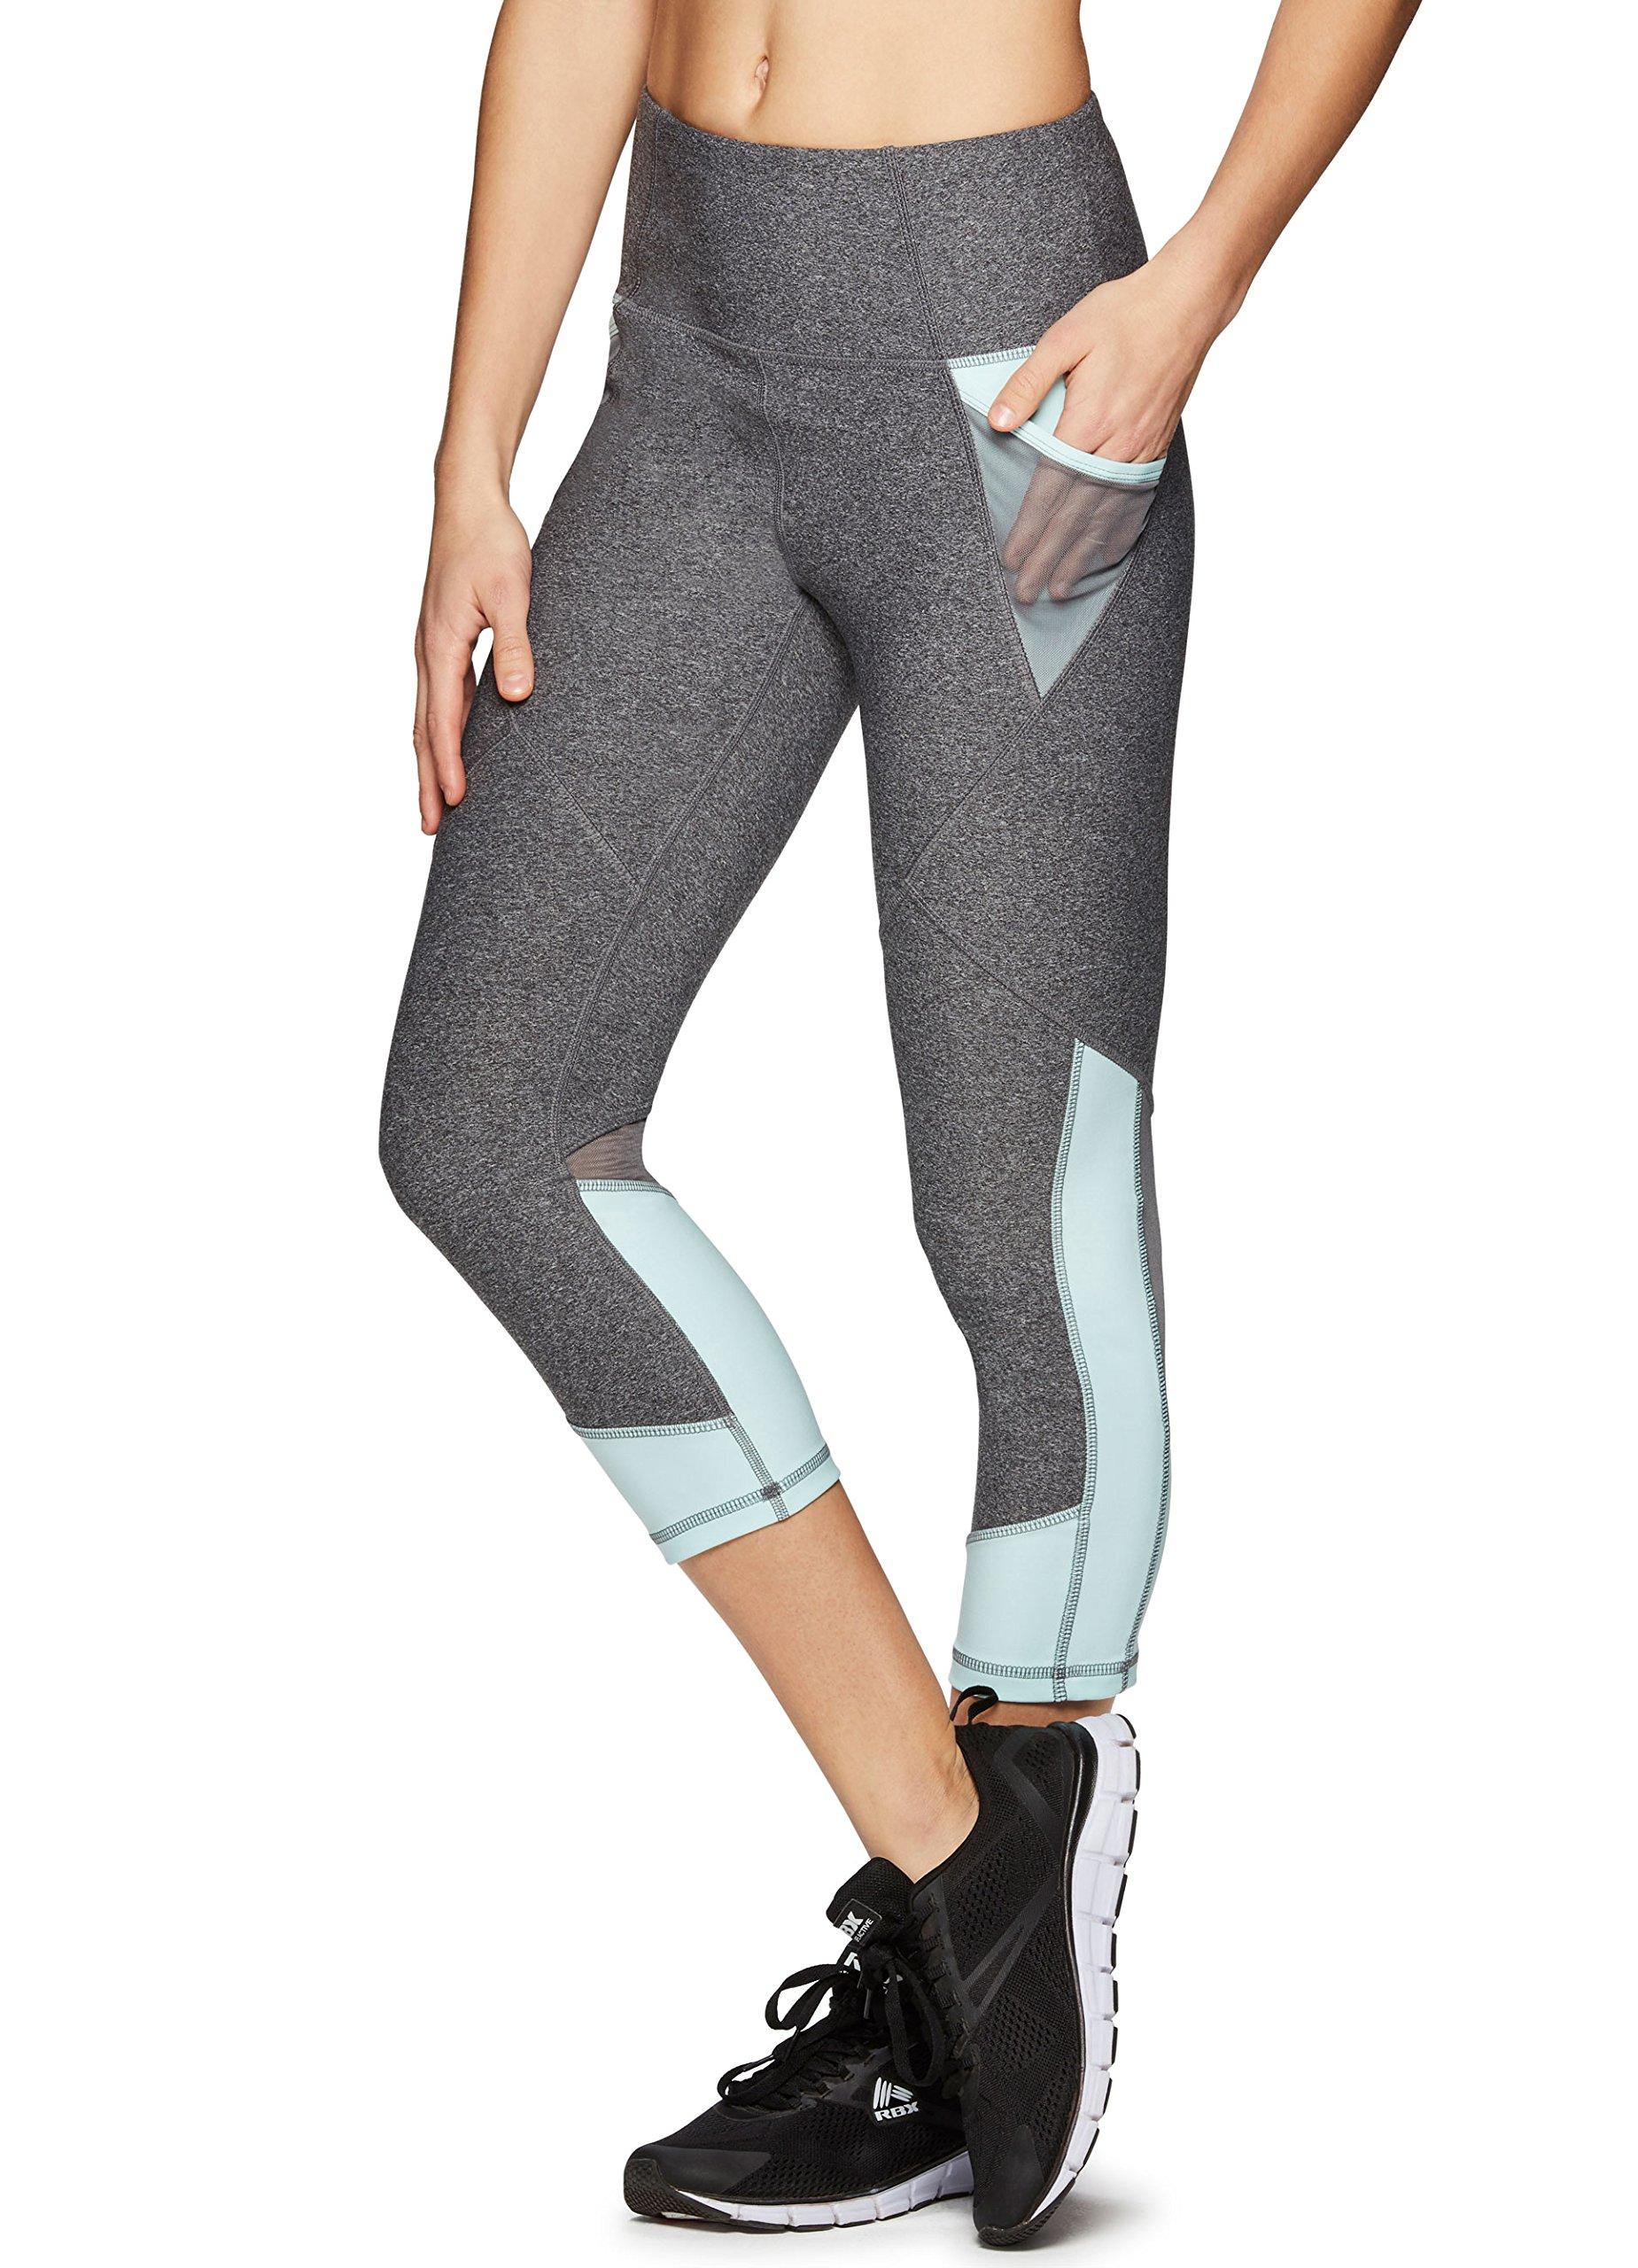 54e884f234 Galleon - RBX Active Women's Mesh Tech Pocket Yoga Capri Leggings Charcoal  Grey L